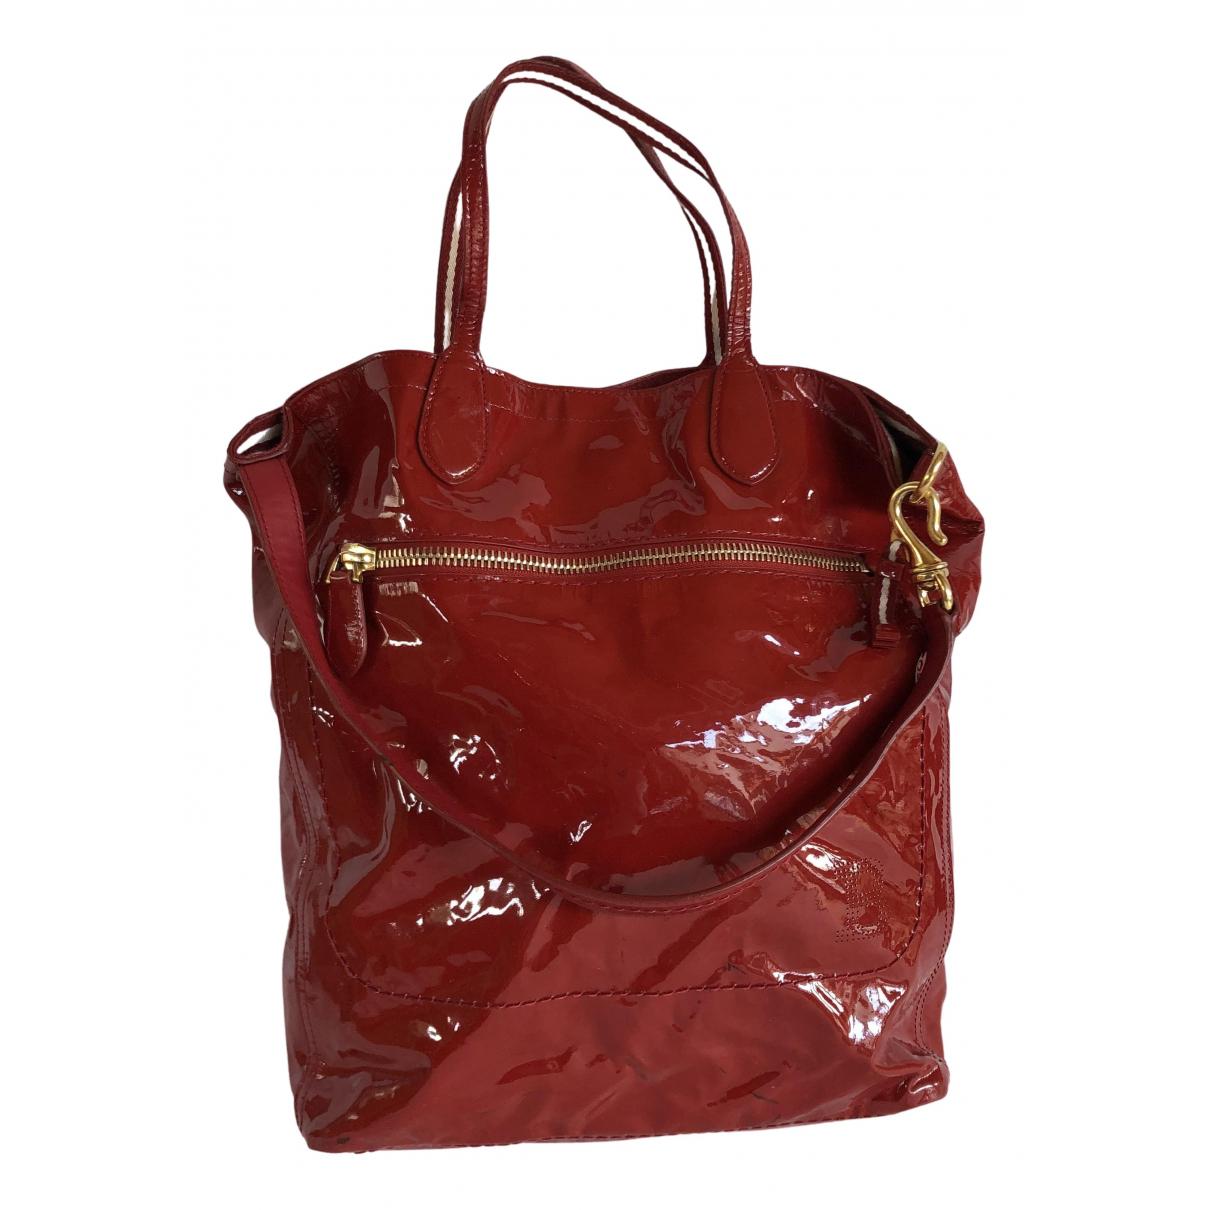 Bally \N Red Patent leather handbag for Women \N